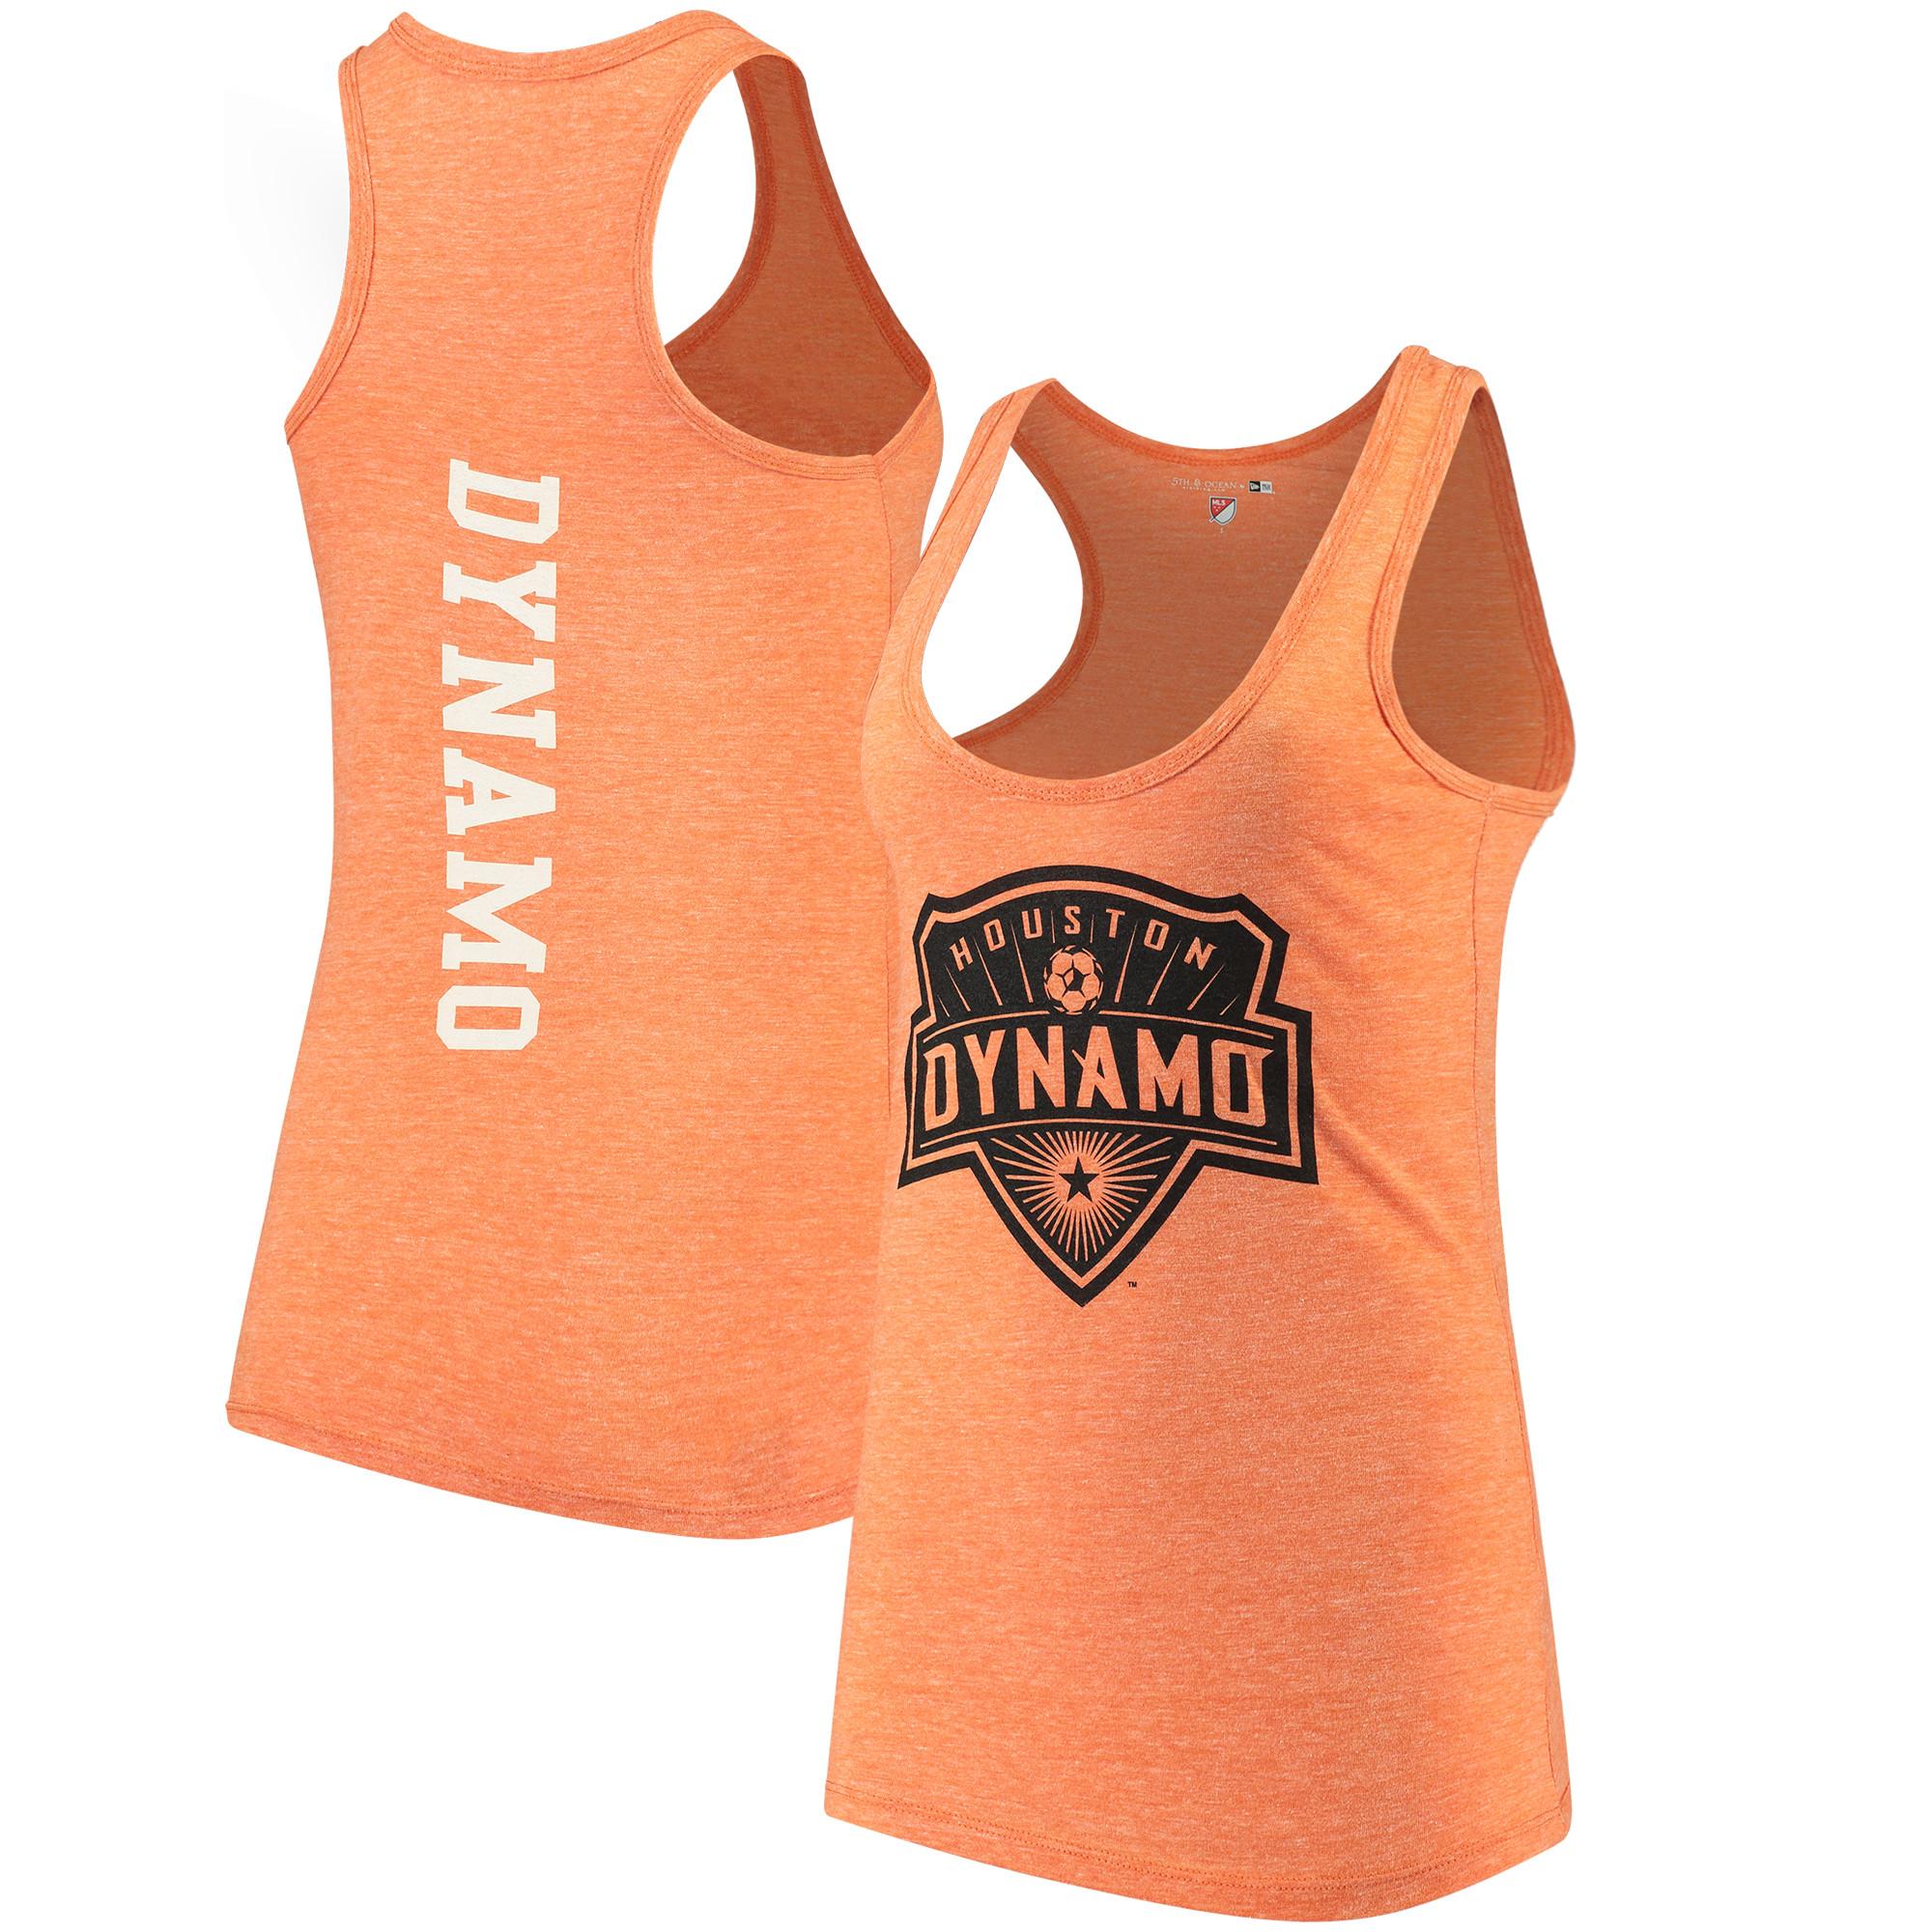 Houston Dynamo 5th & Ocean by New Era Women's Tri-Blend Racerback Tank Top - Orange